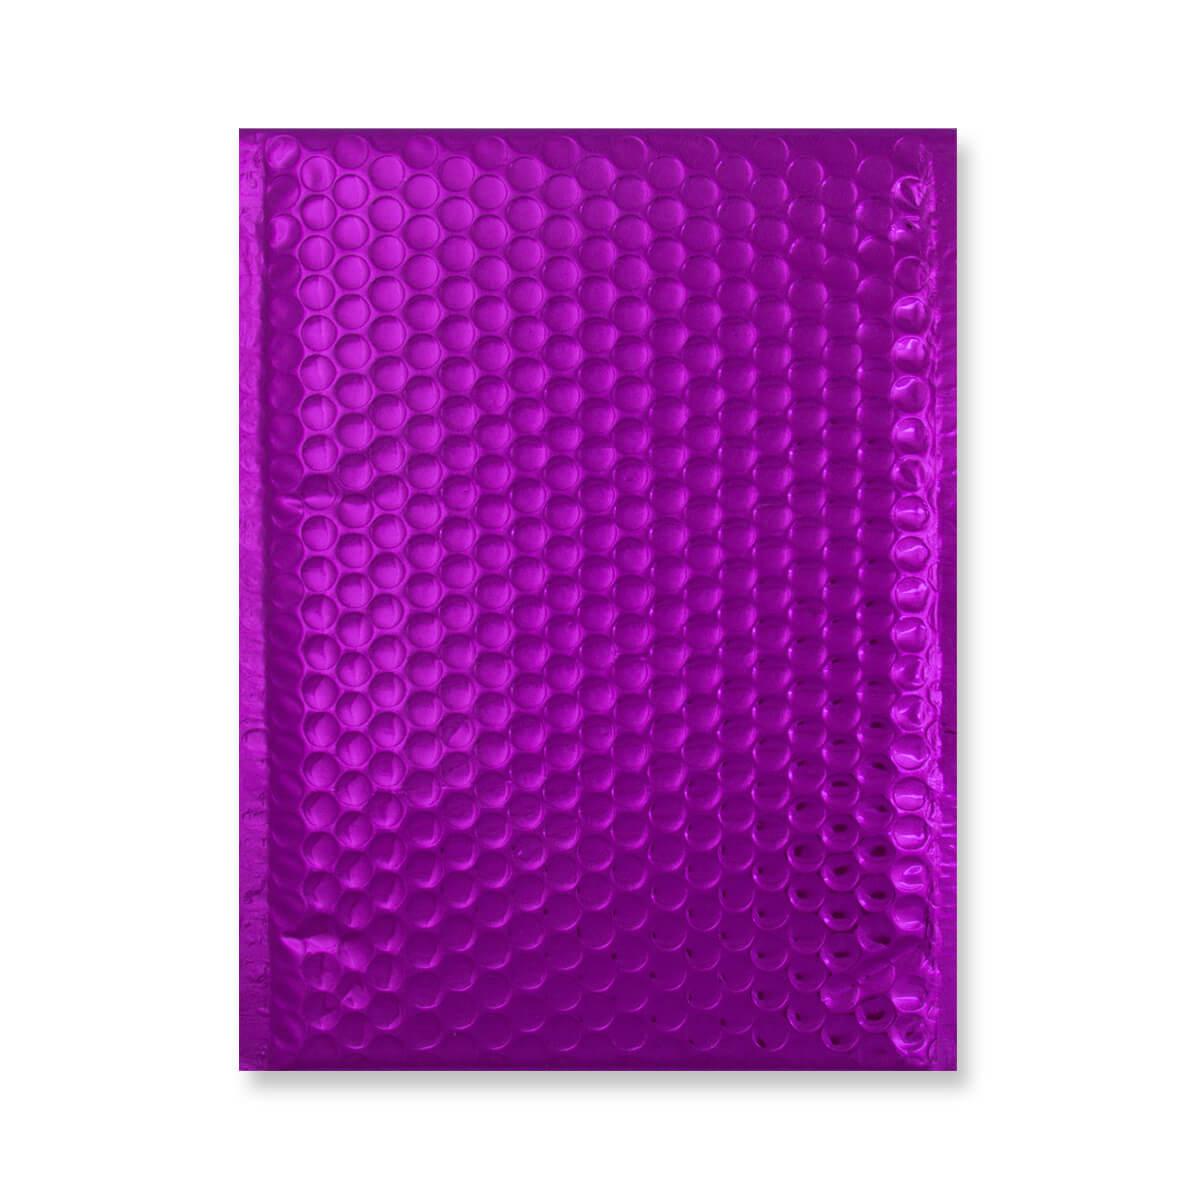 C5 + GLOSS METALLIC PURPLE PADDED ENVELOPES (250 x 180MM)